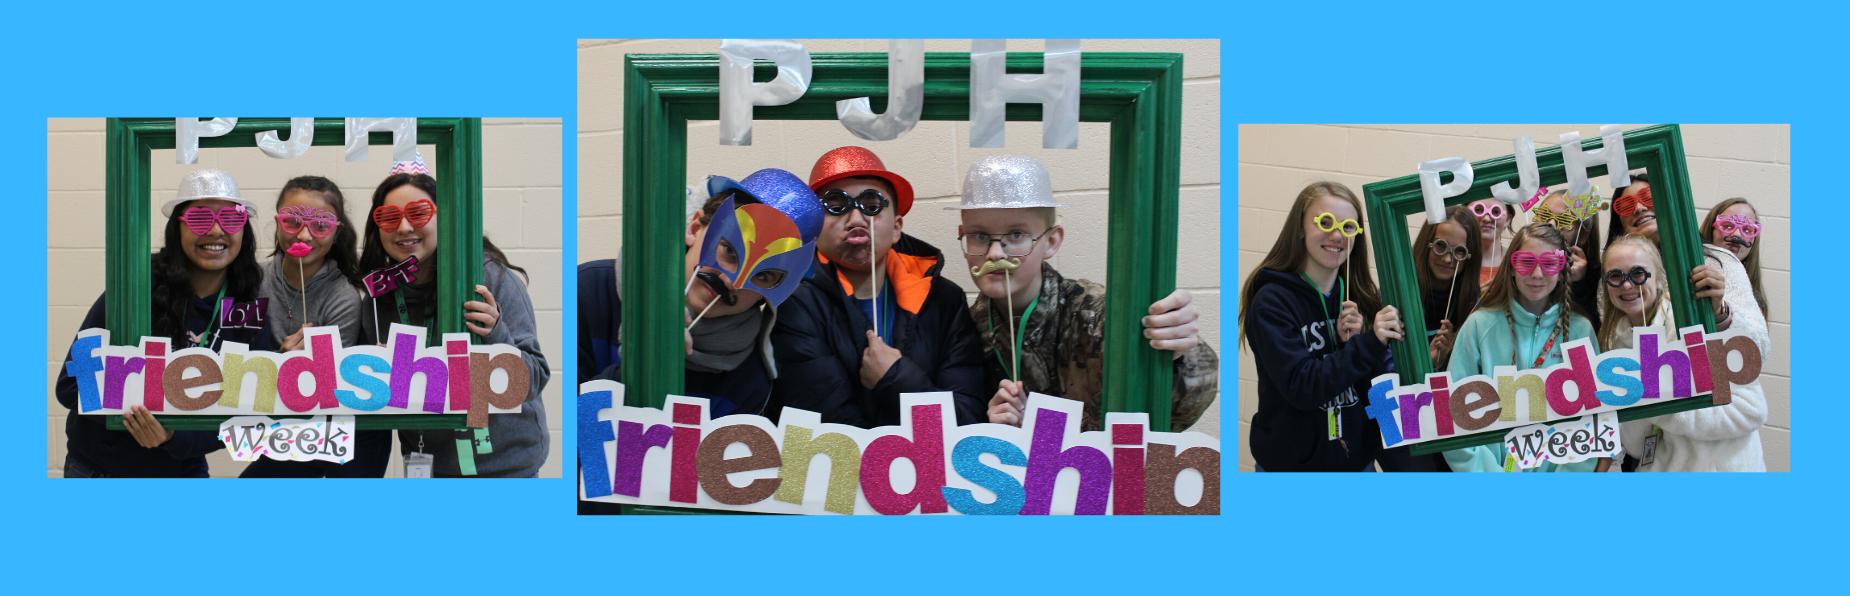 8th grade friendship